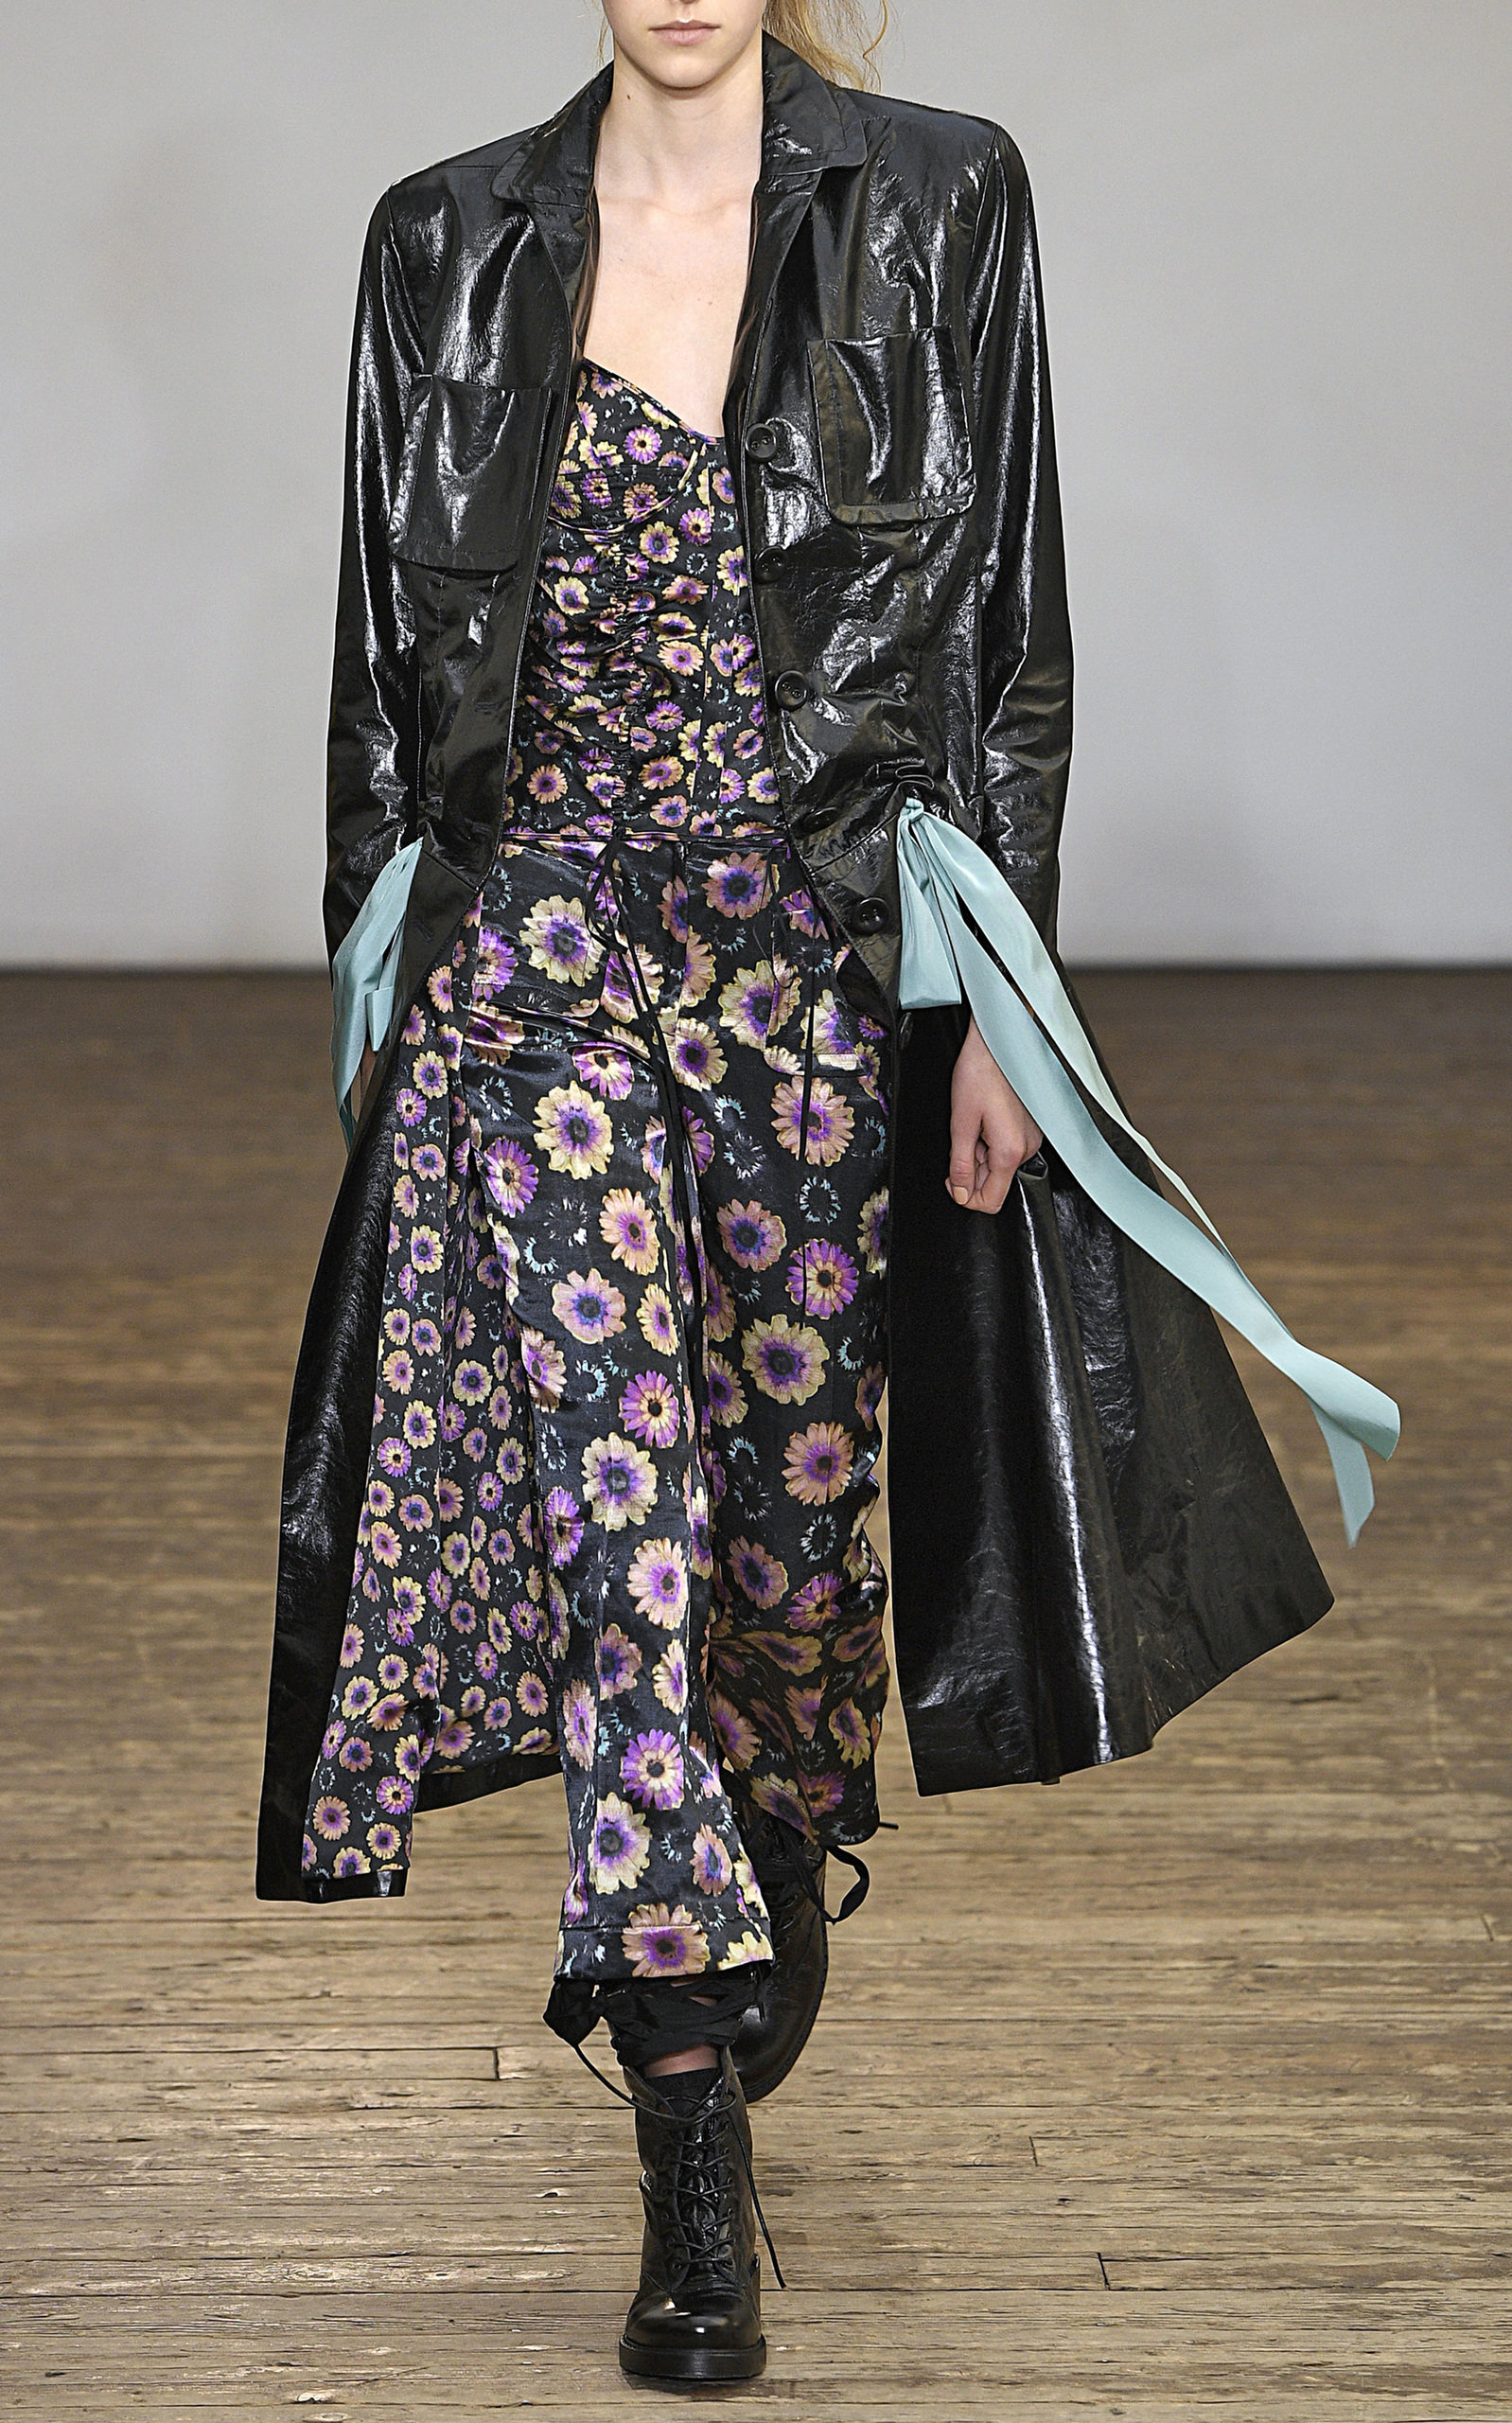 Moda Tailored Coat Leather Operandi By Olivier Naper Theyskens p1qRcf4fU